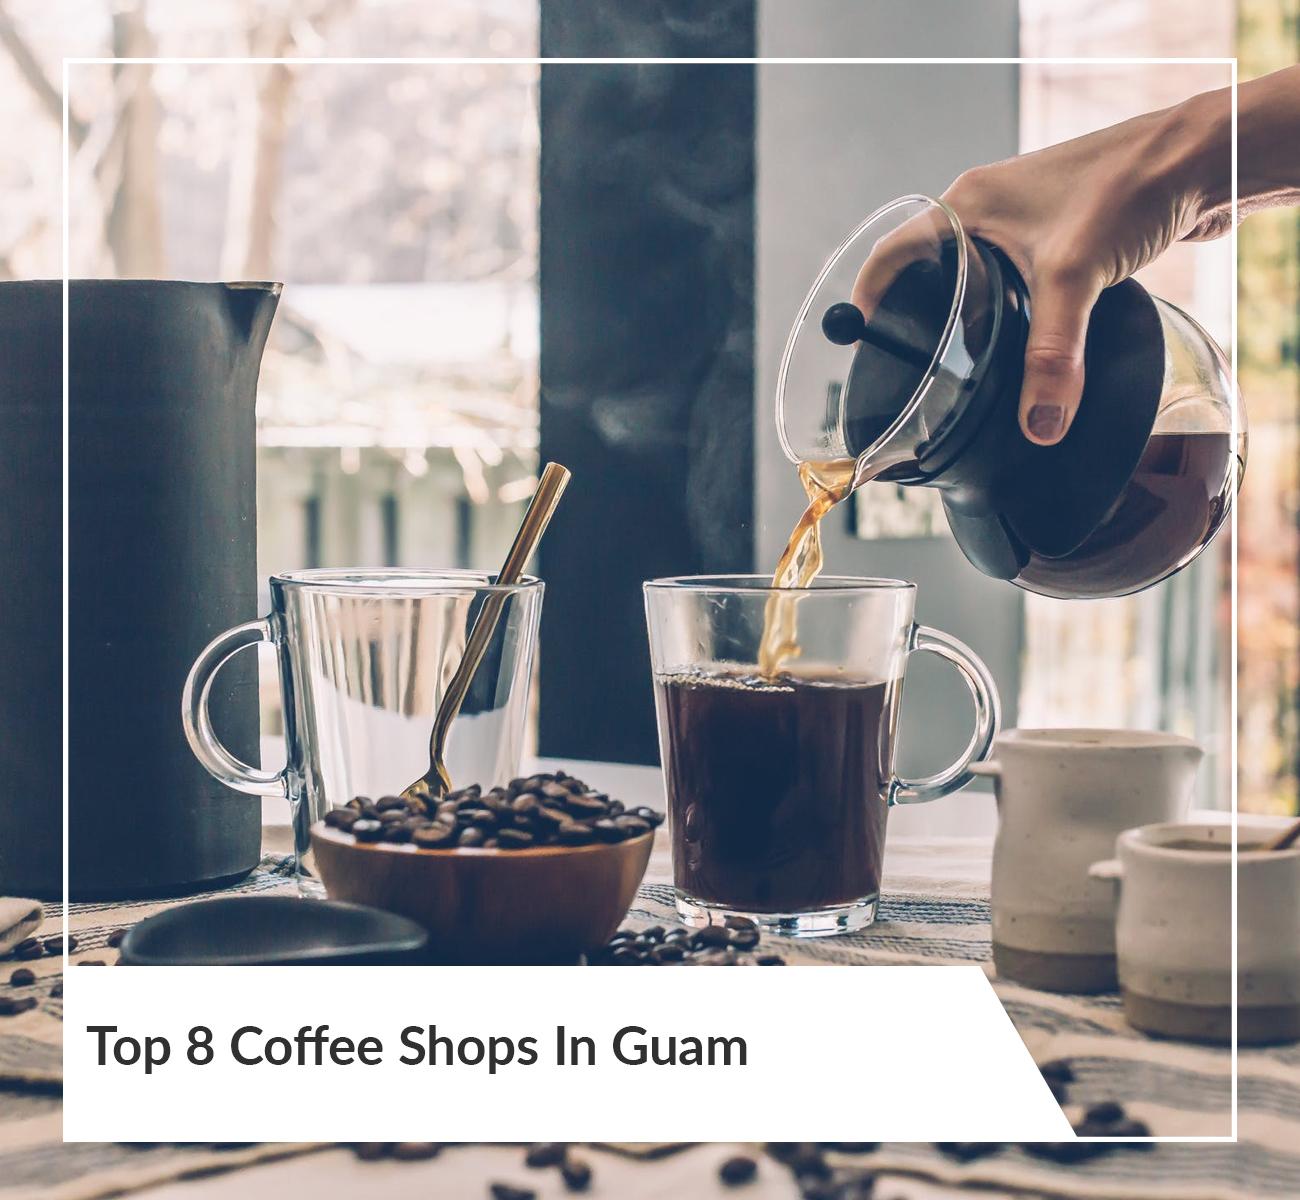 Coffee Shops in Guam